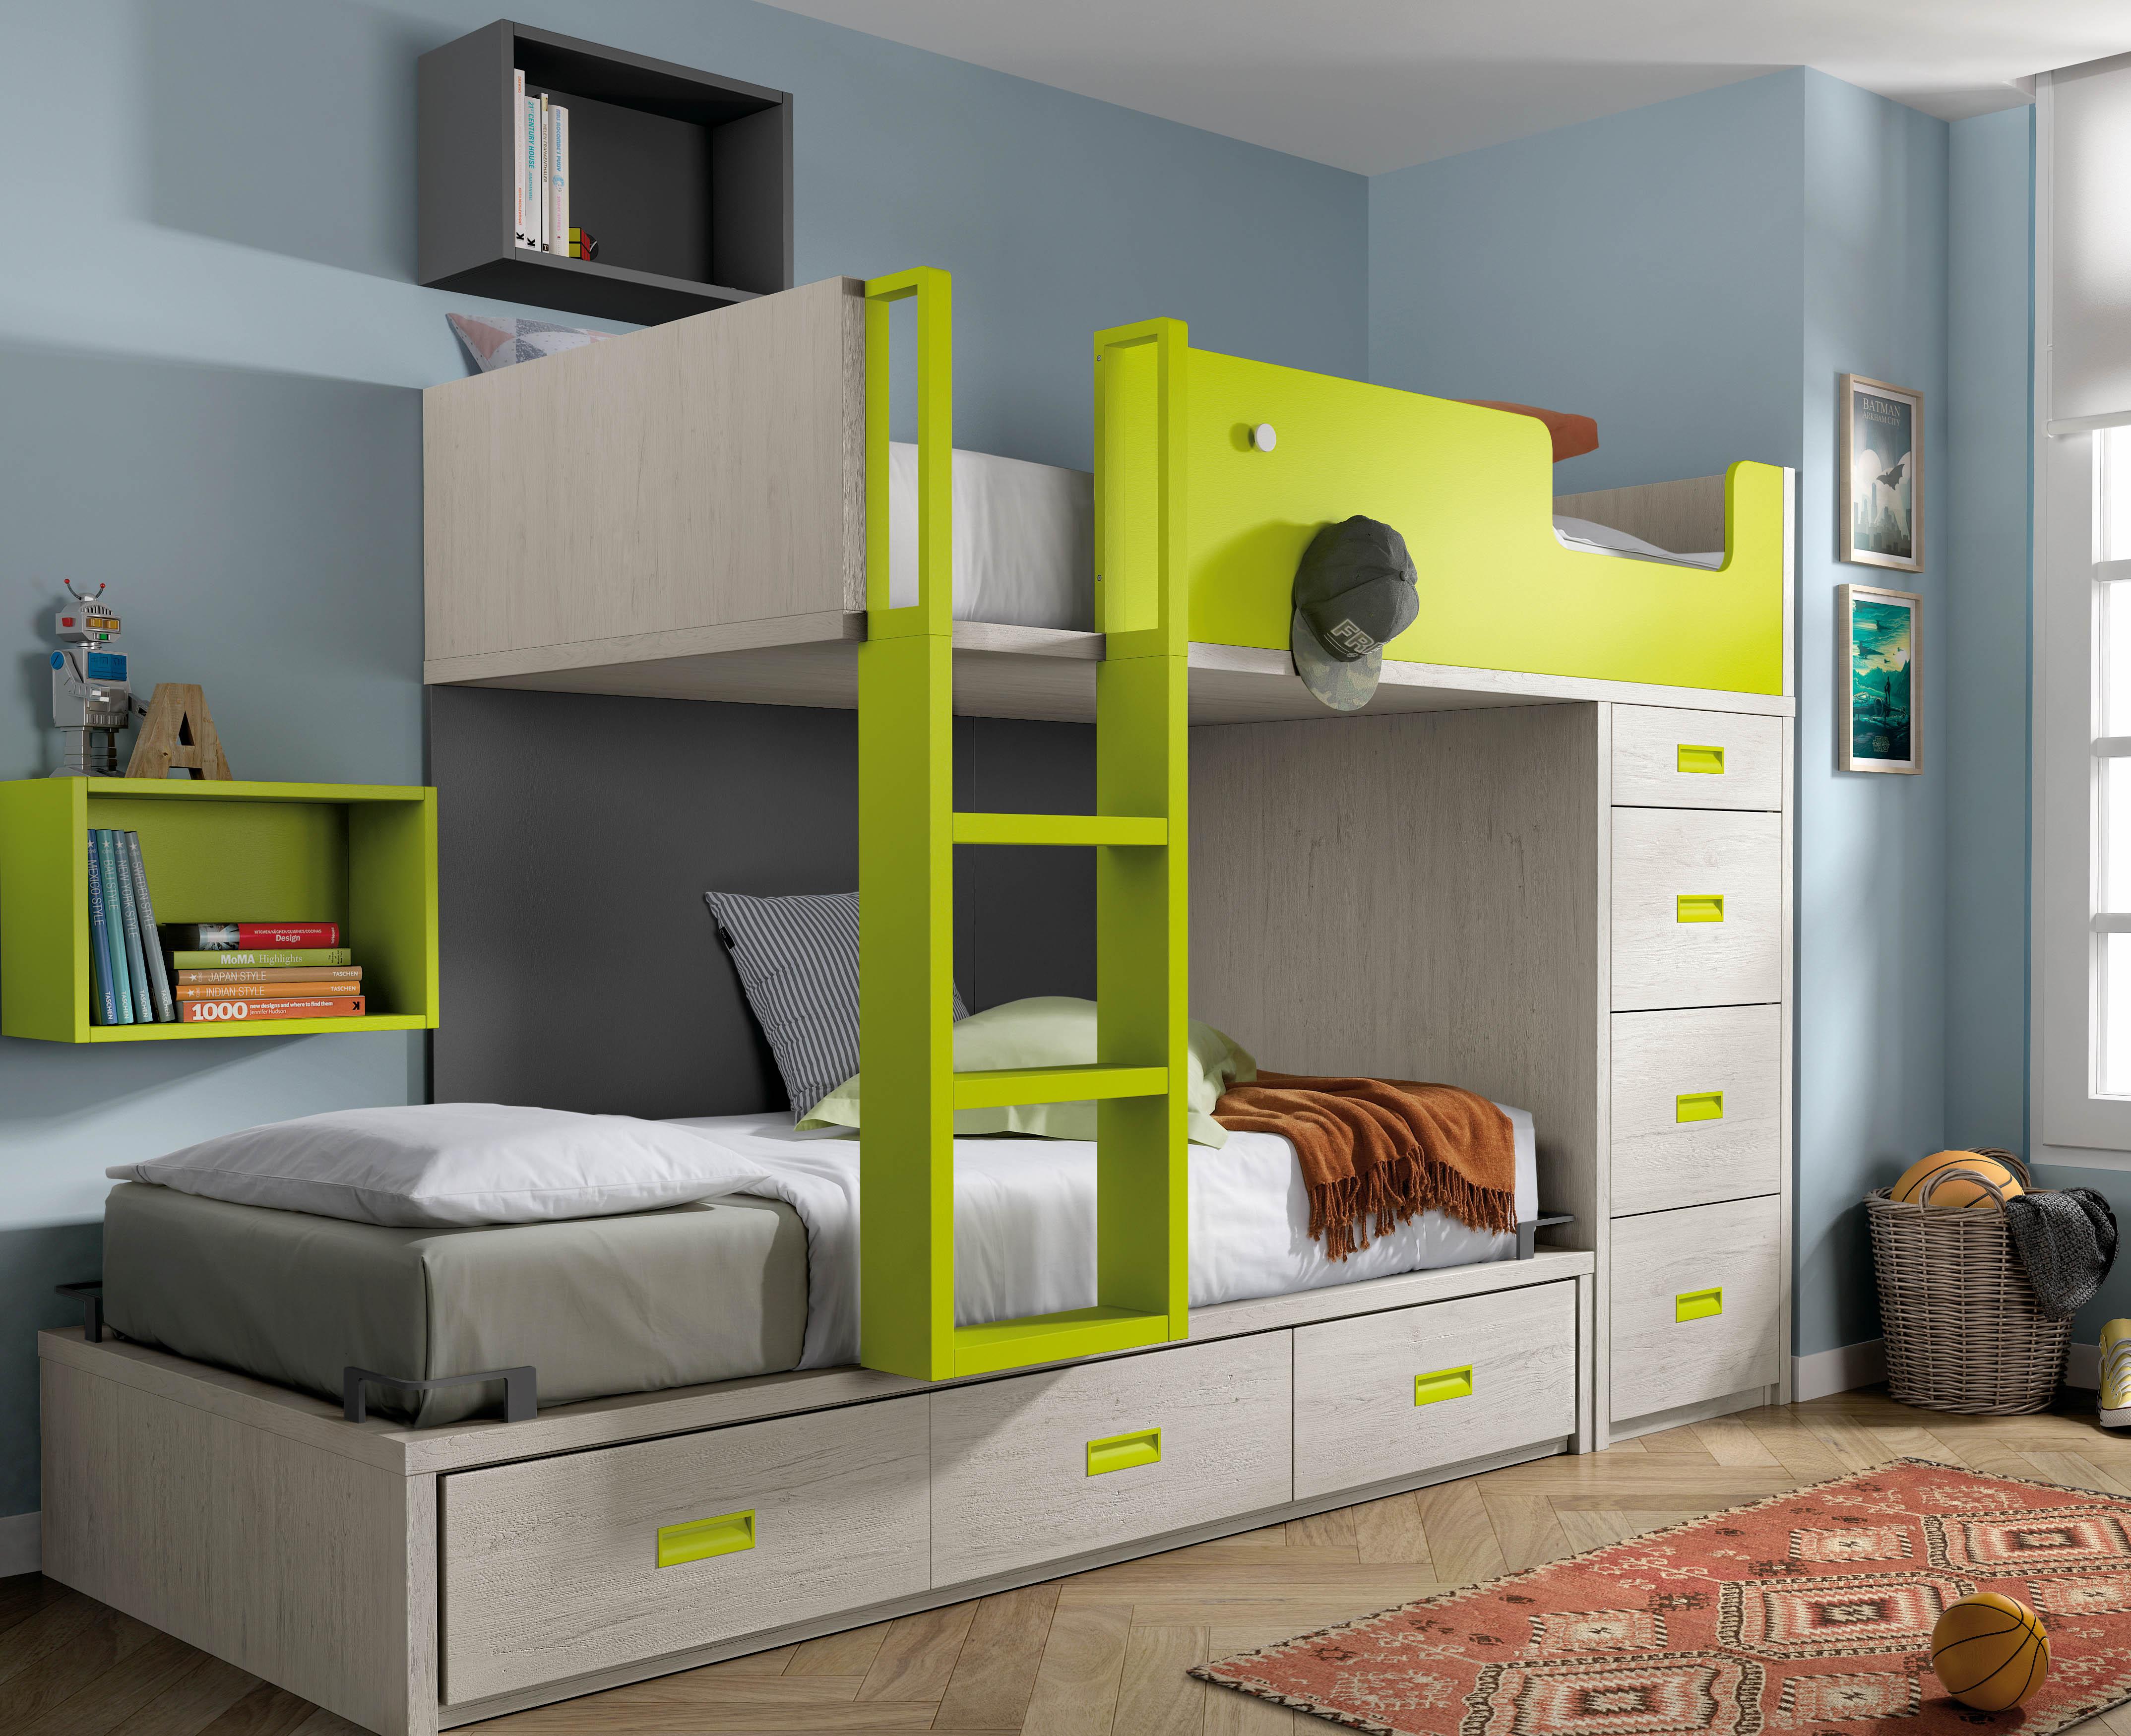 Muebles juveniles cama tren dormitorios juveniles cama - Habitaciones juveniles tren ...